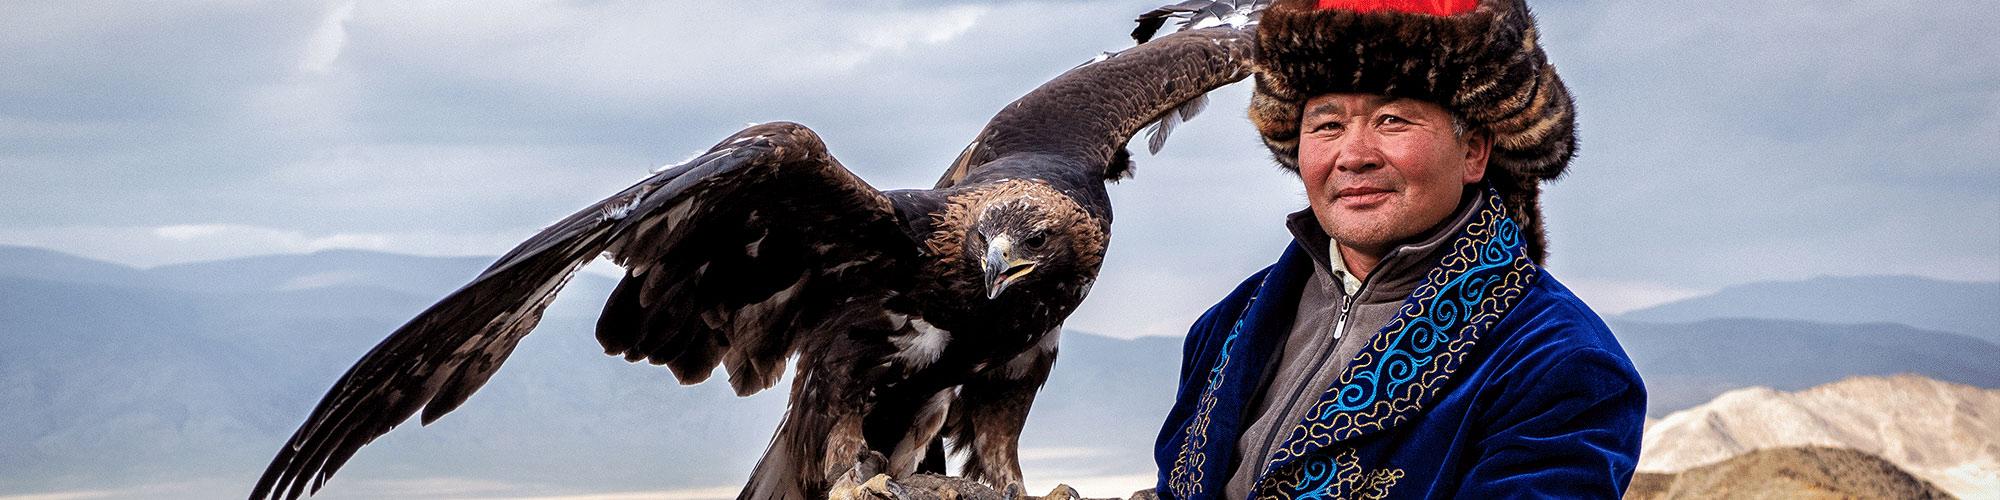 Viajes Mongolia - El País Viajes